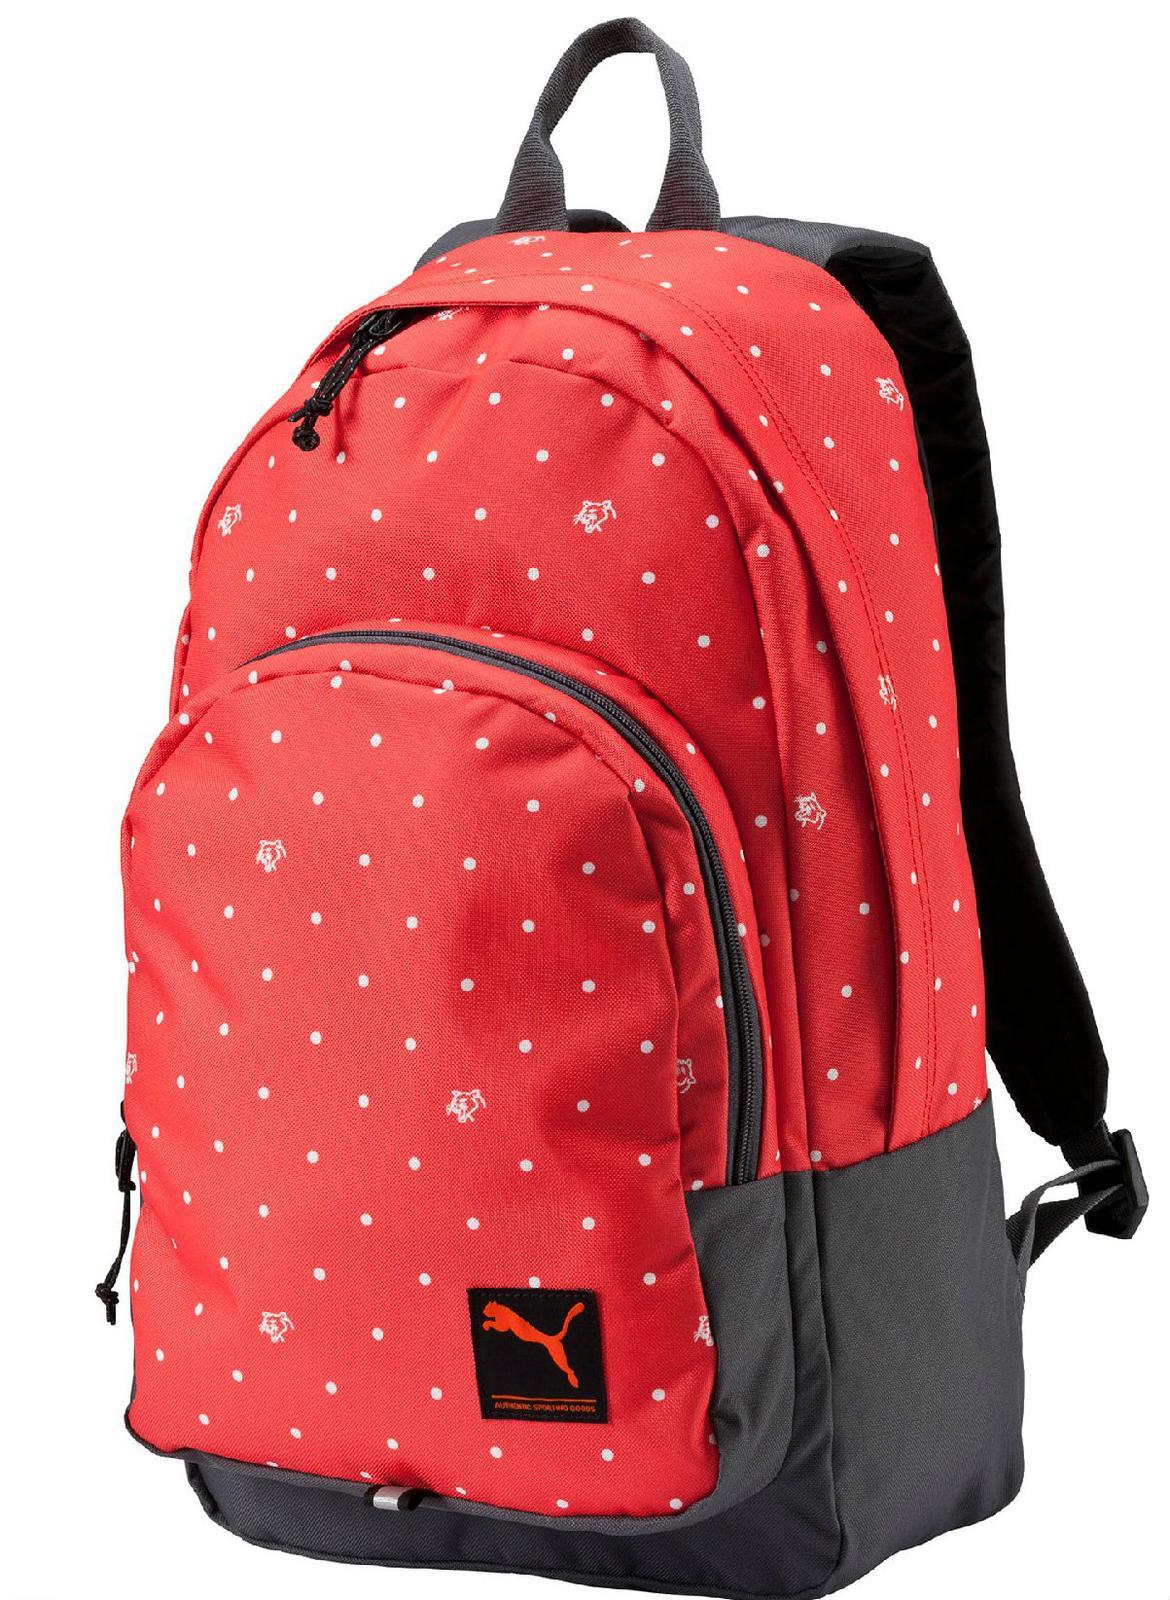 9d8c970d7 PUMA-PUMA Academy Backpack cayenne-polka dot | EXIsport Eshop